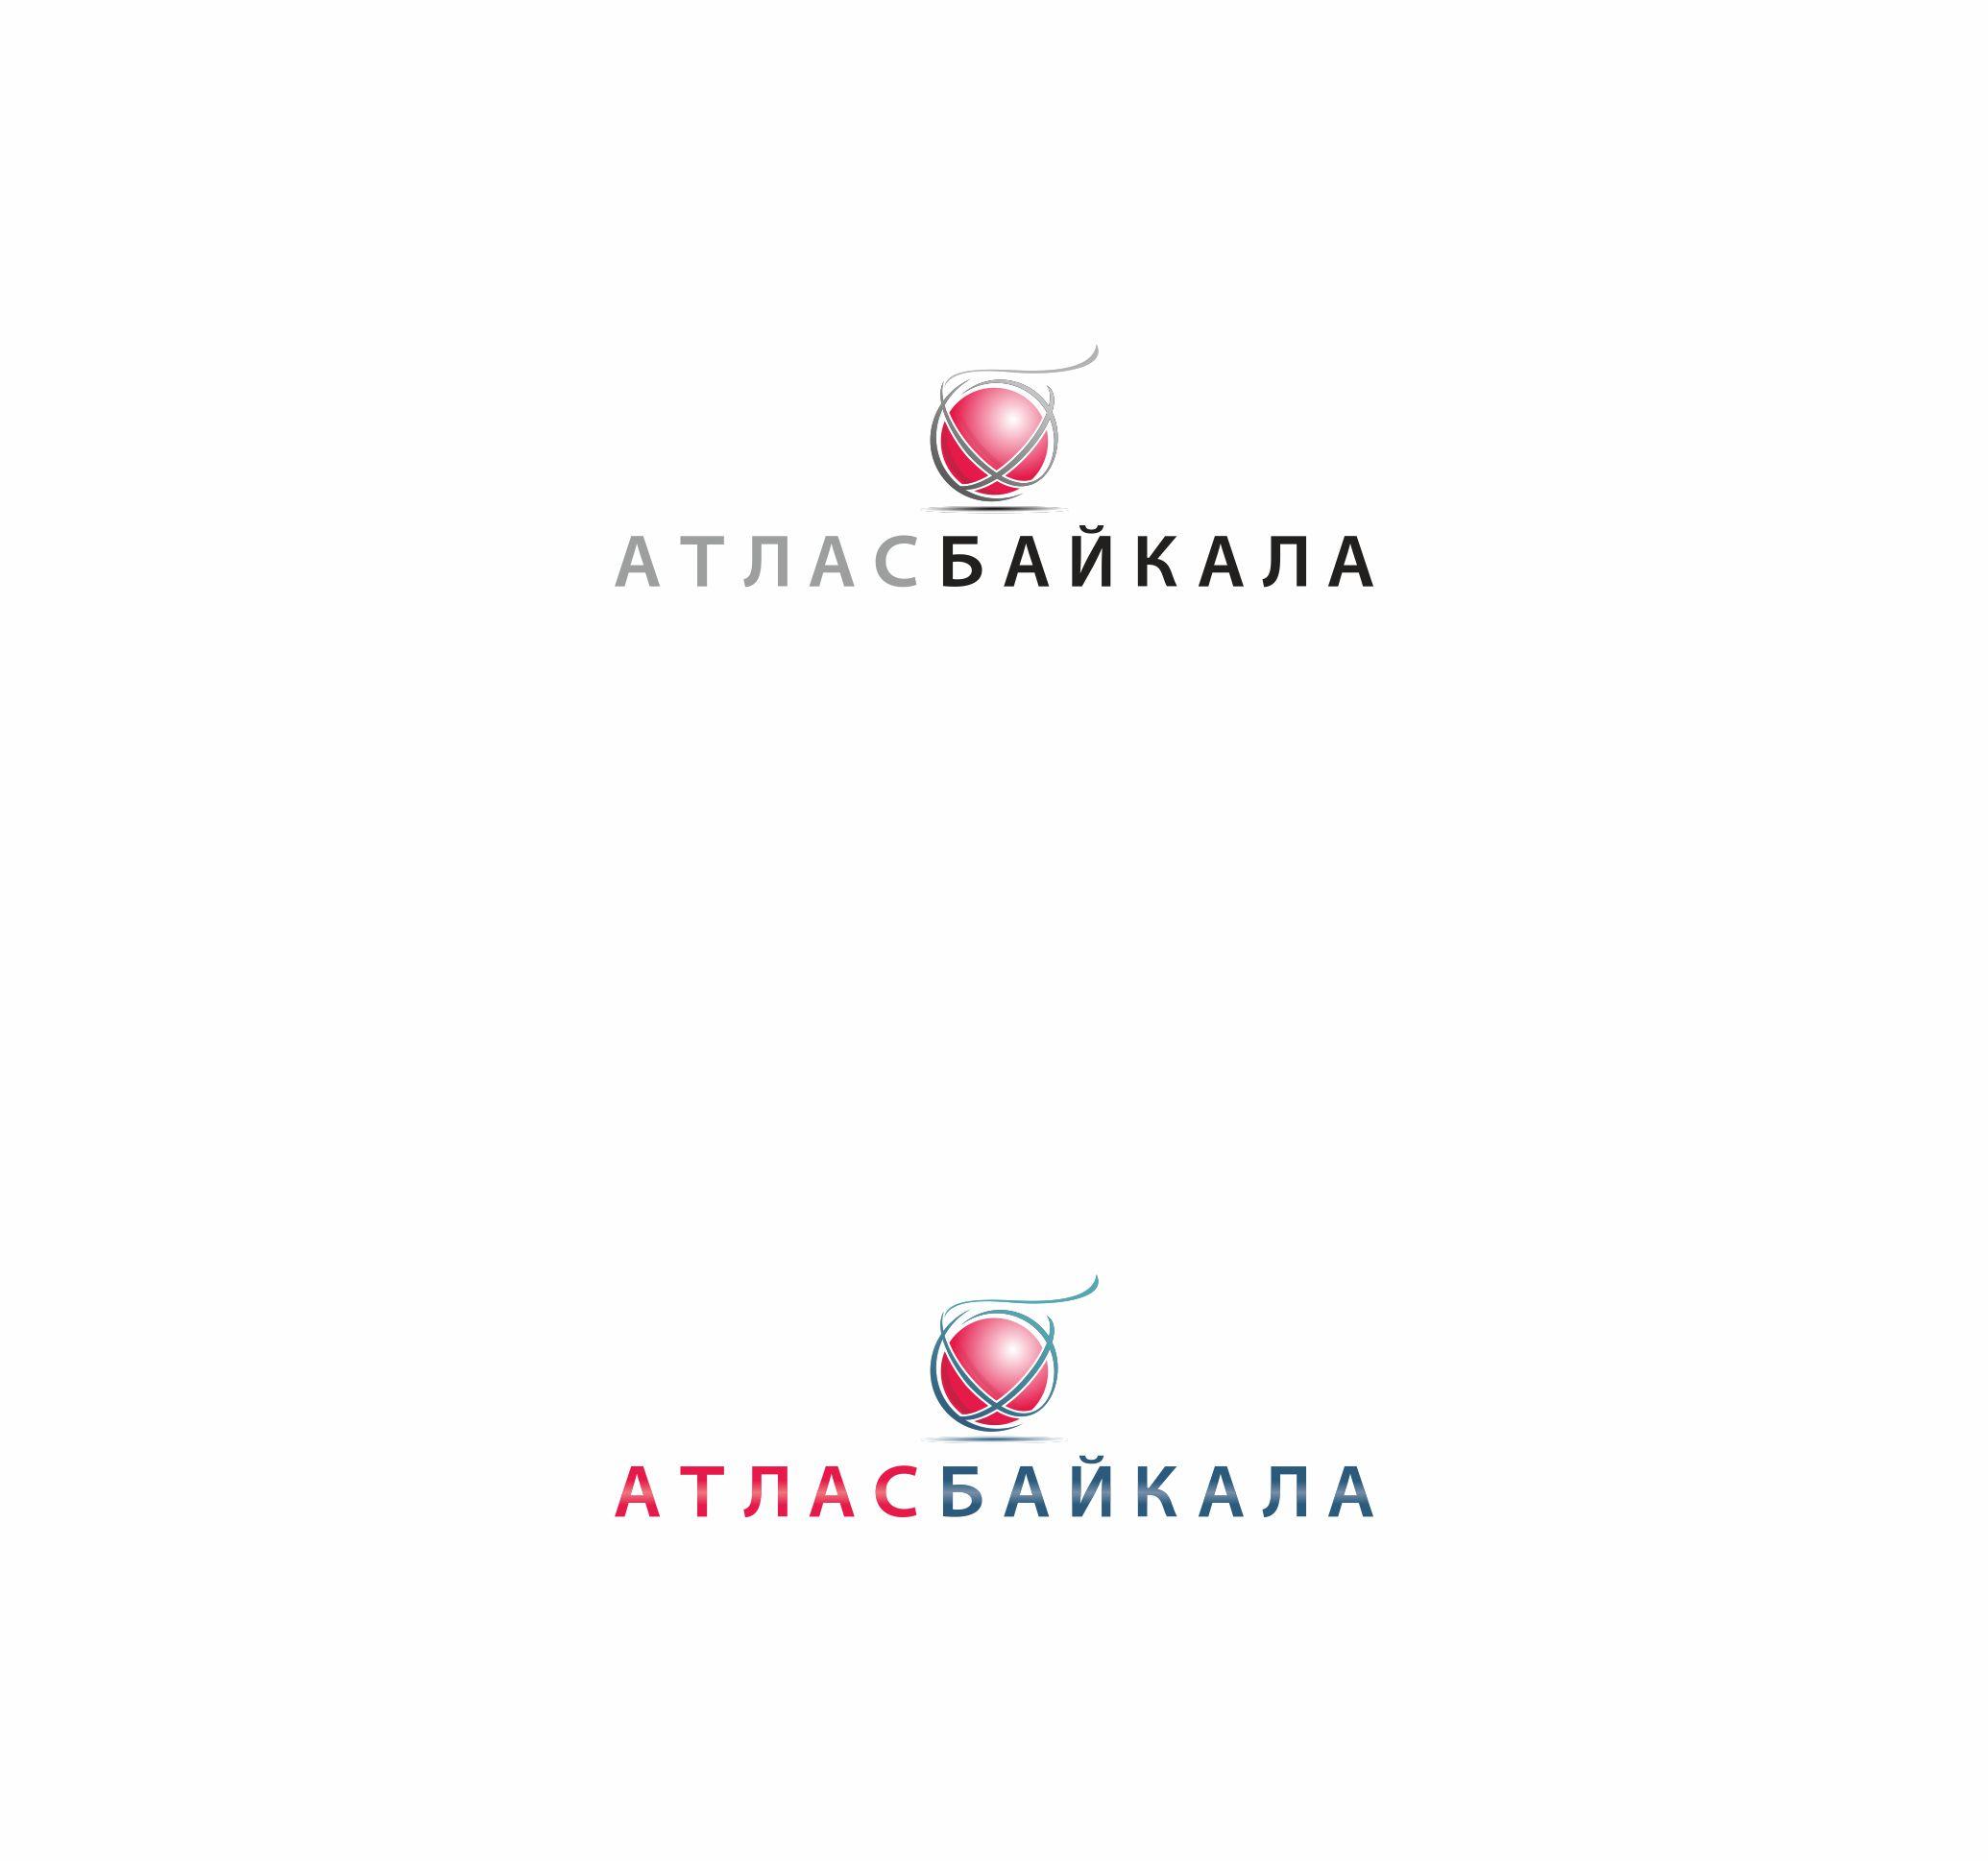 Разработка логотипа Атлас Байкала фото f_5935afc8e3ead1b8.jpg